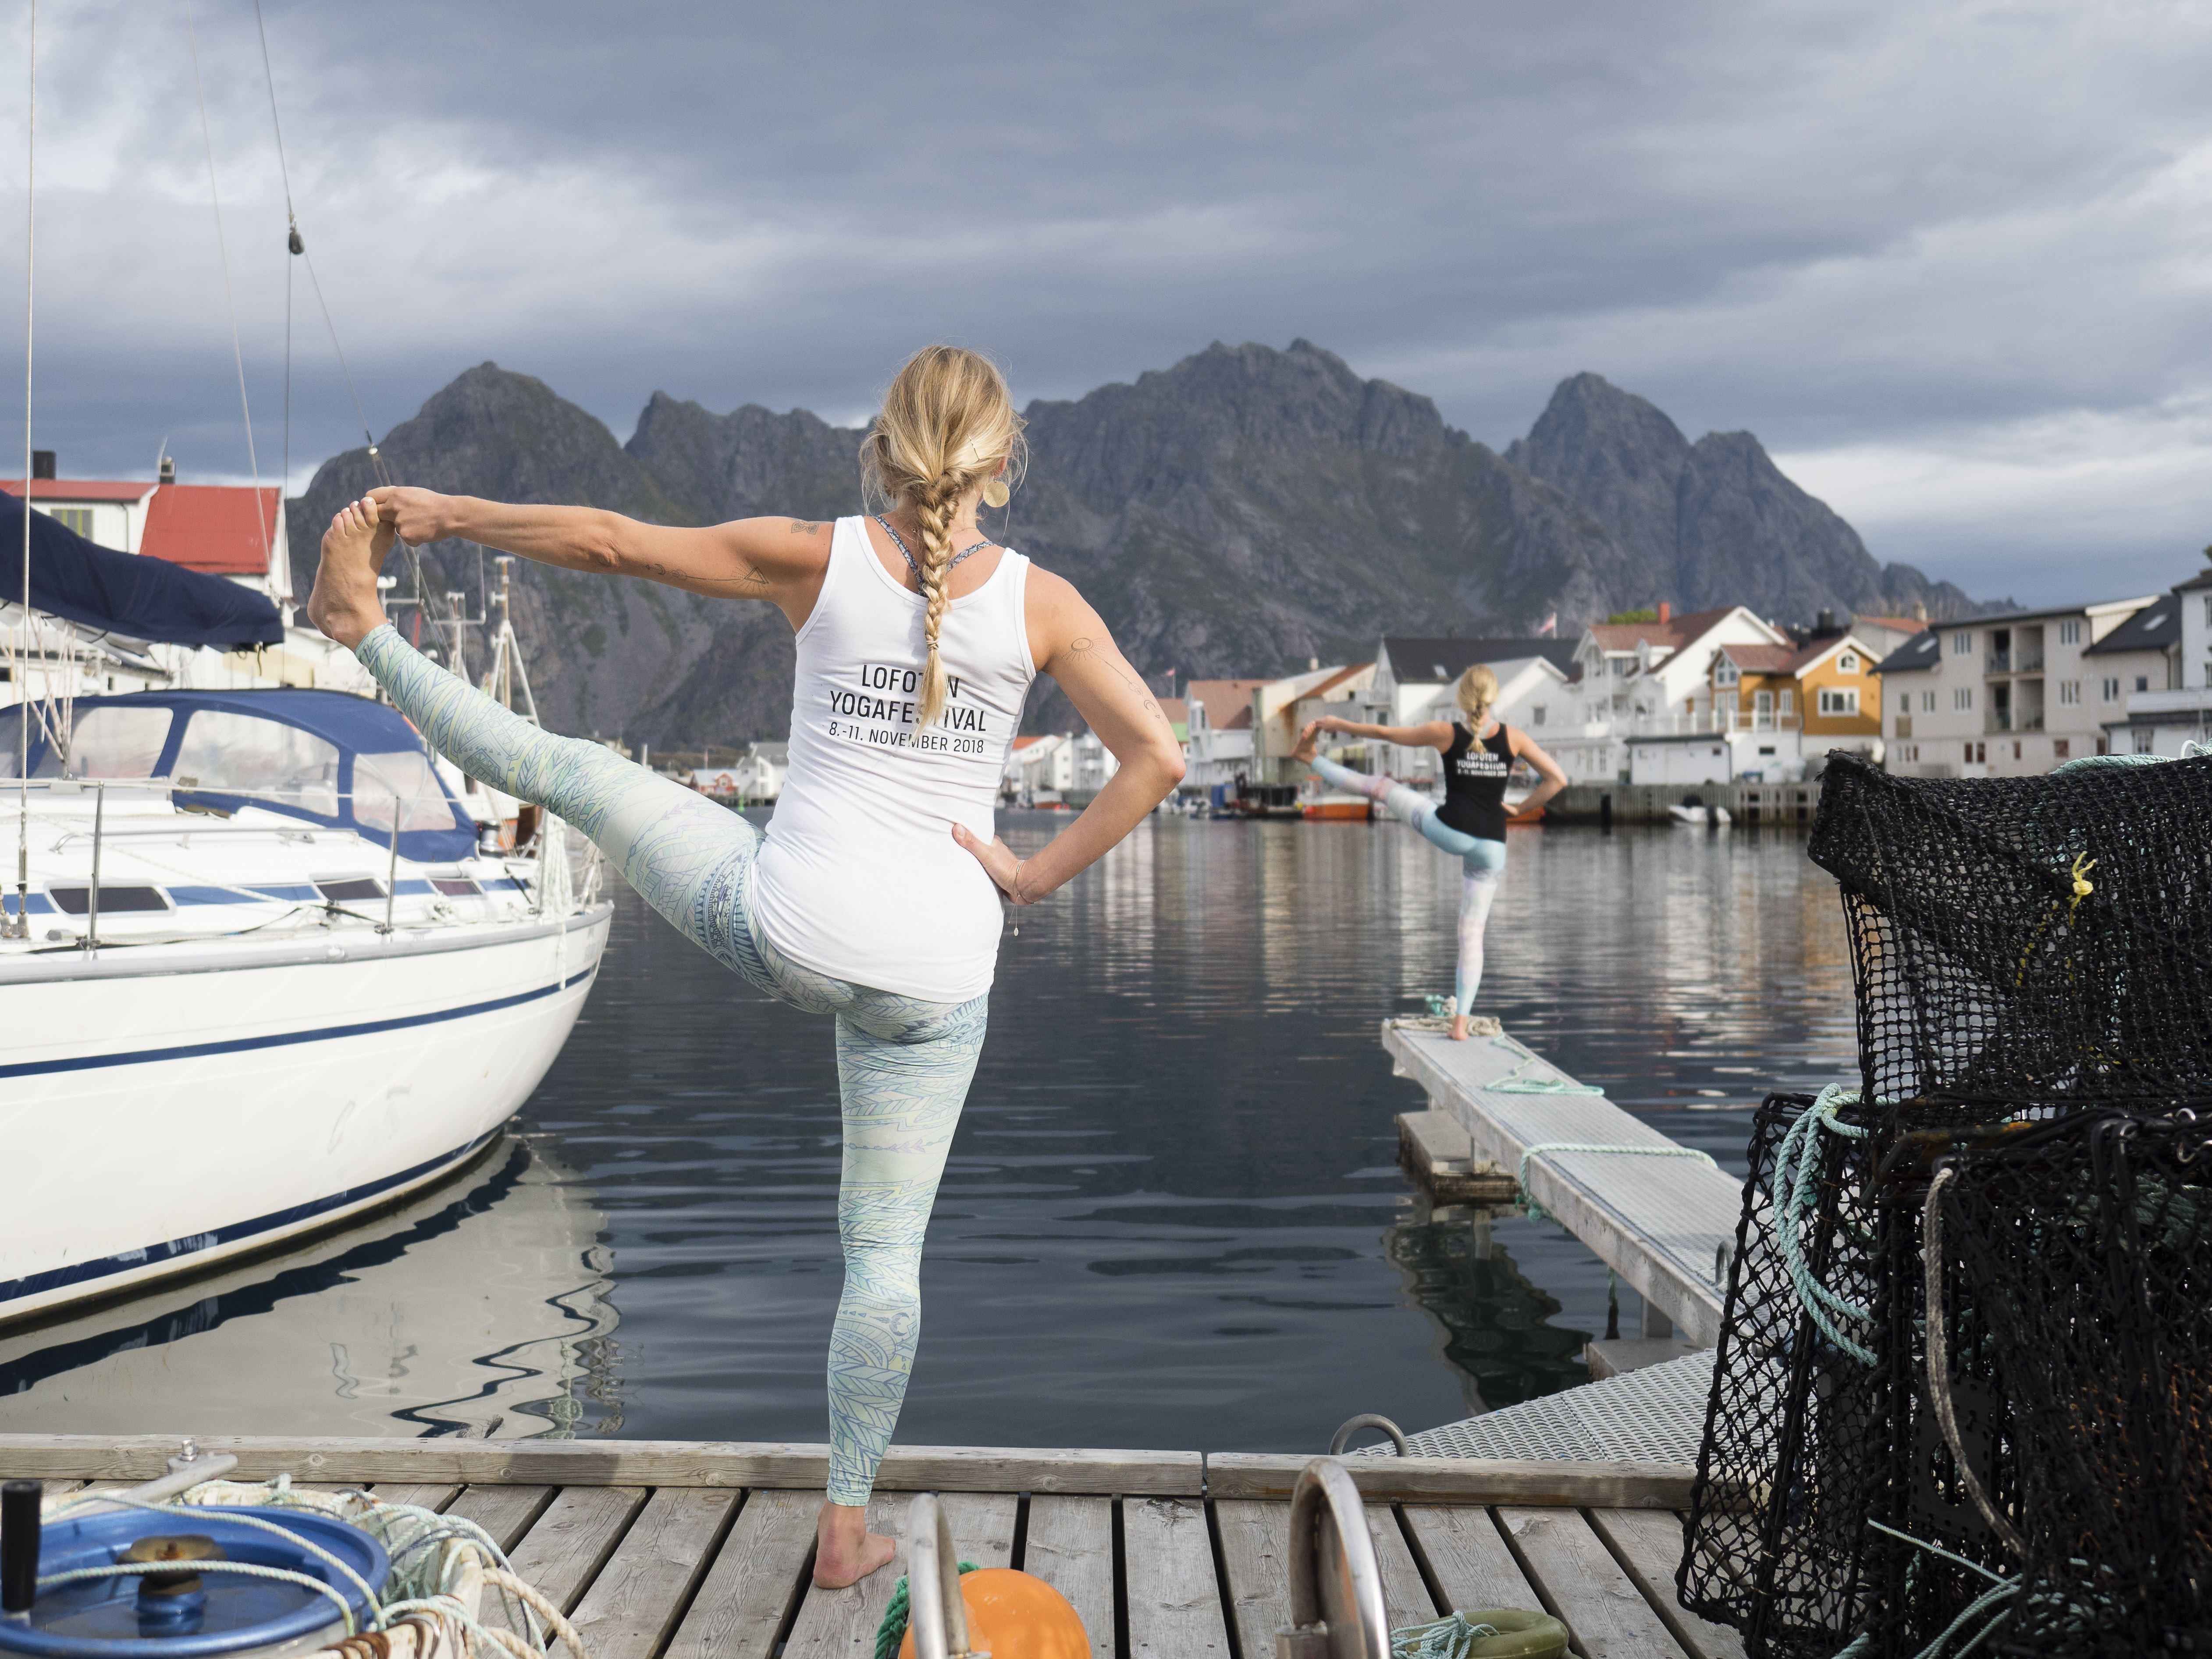 © Kristin Folsland Olsen , Lofoten Yogafestival 2018